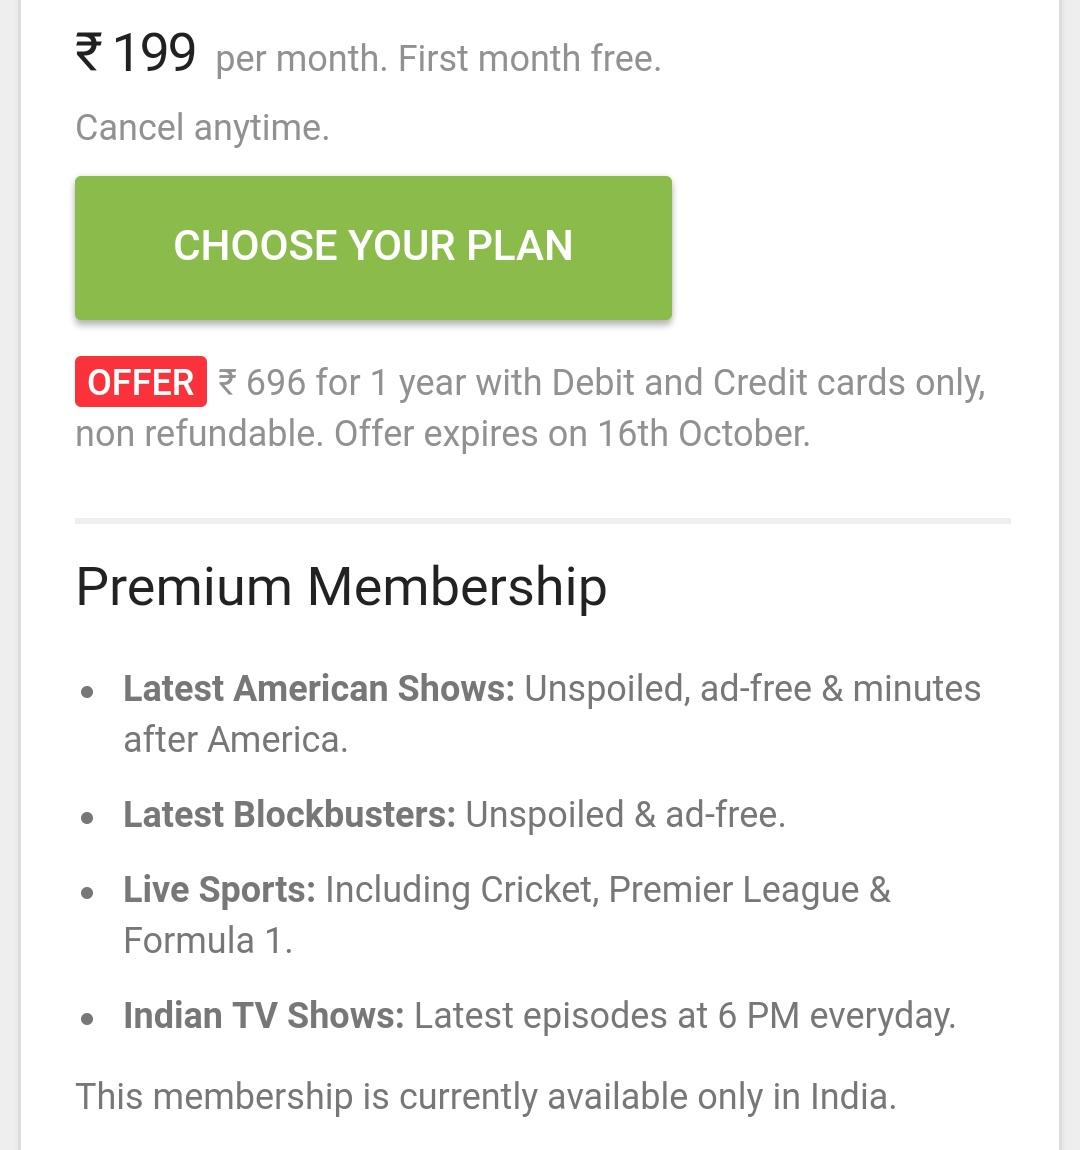 Update - Hotstar Premium Membership ₹696 for 1 year